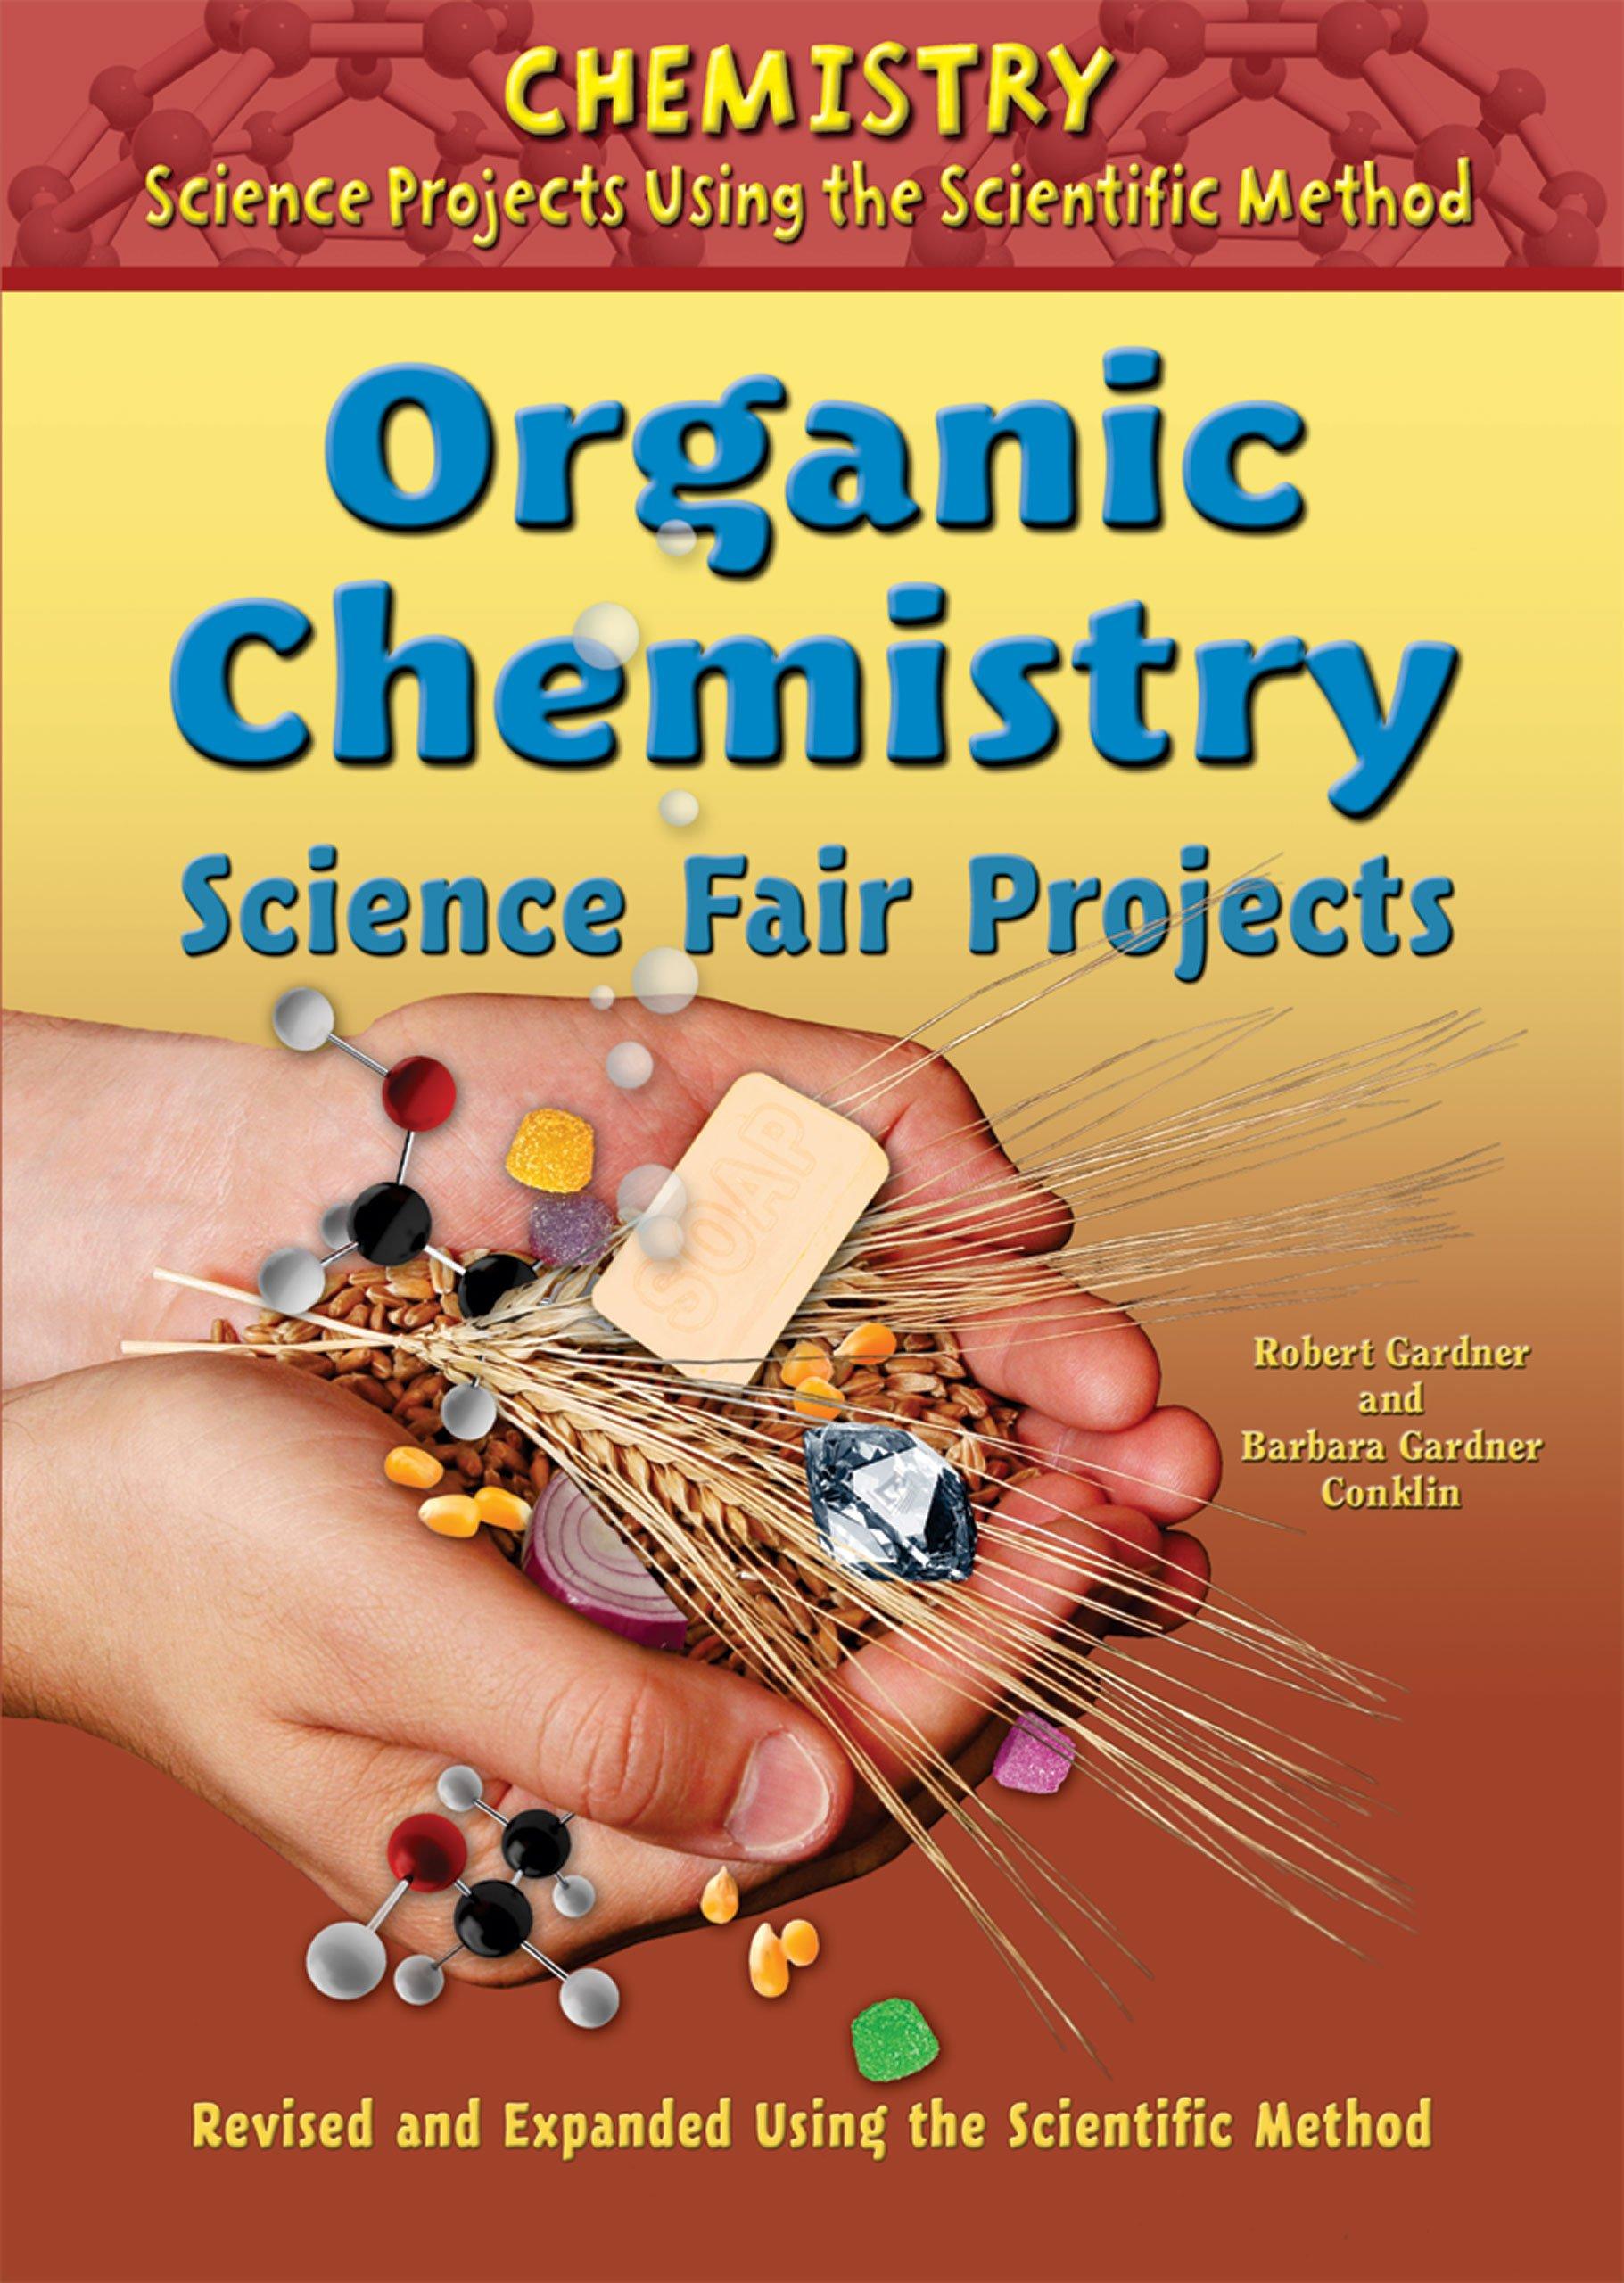 Download Organic Chemistry Science Fair Projects (Chemistry Science Projects Using the Scientific Method) pdf epub